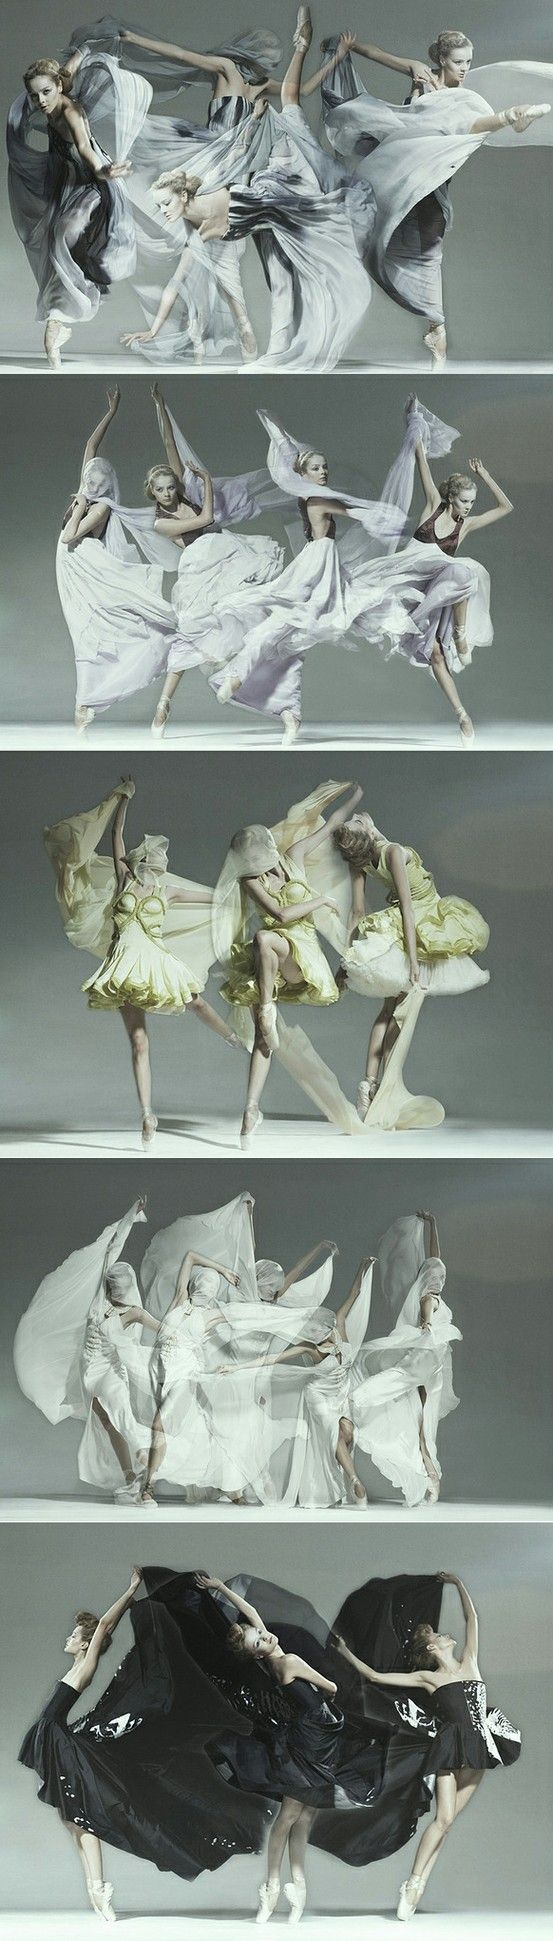 fabric movement - capturing amazing shots of fashion & the art of dance #photographyinspiration...x